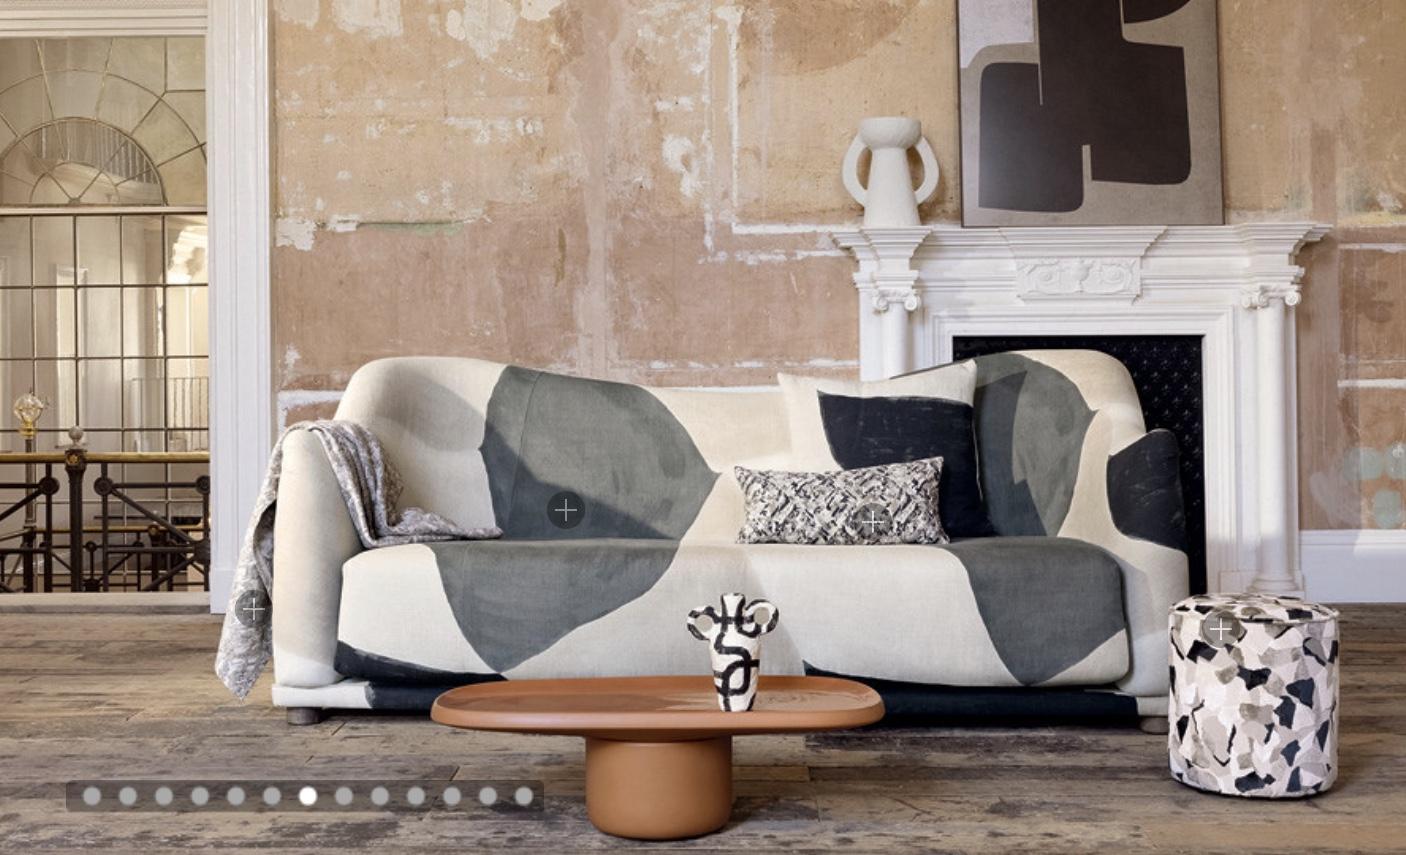 Kirkbydesign Tygkollektion Burst Decorative Weaves and Prints